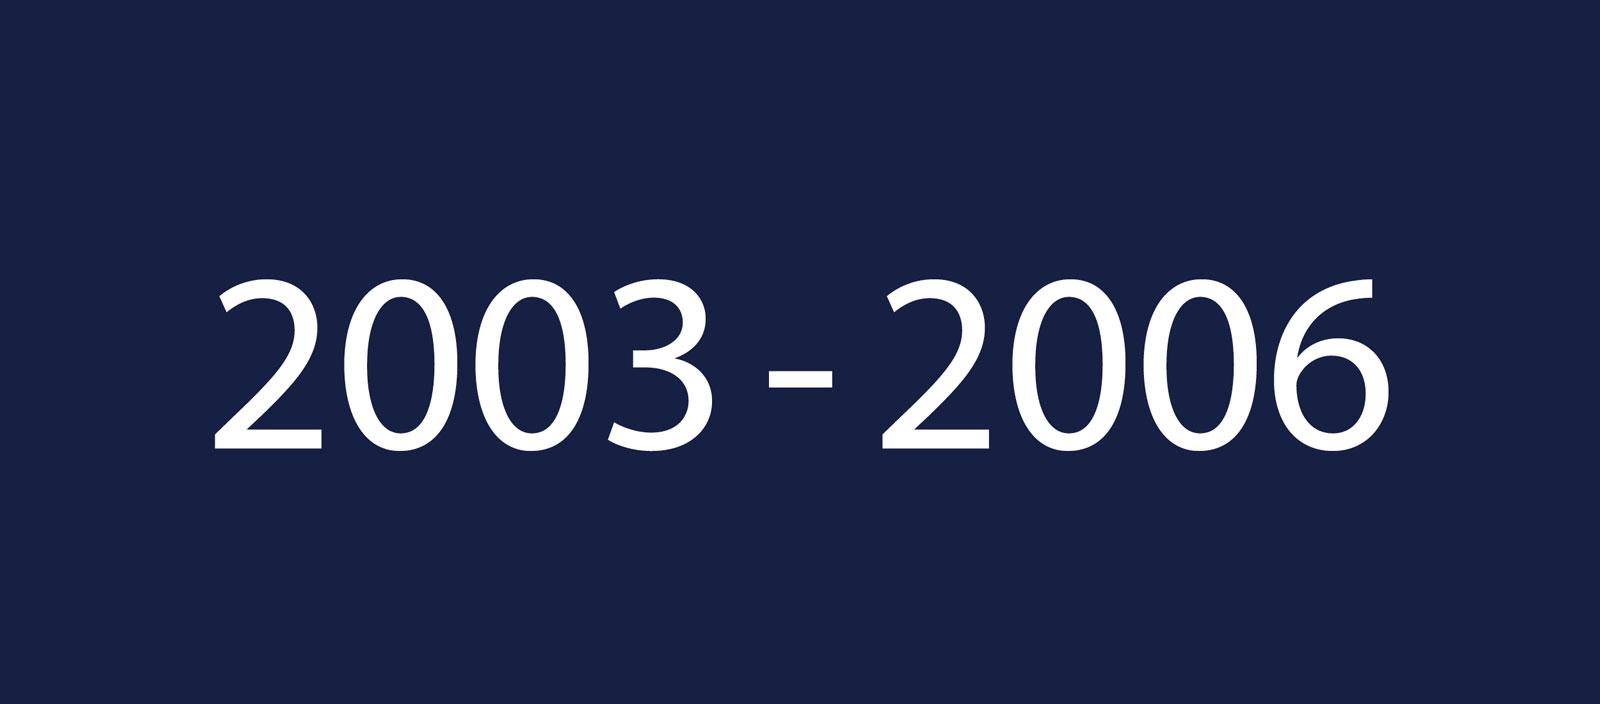 2003 2006 1